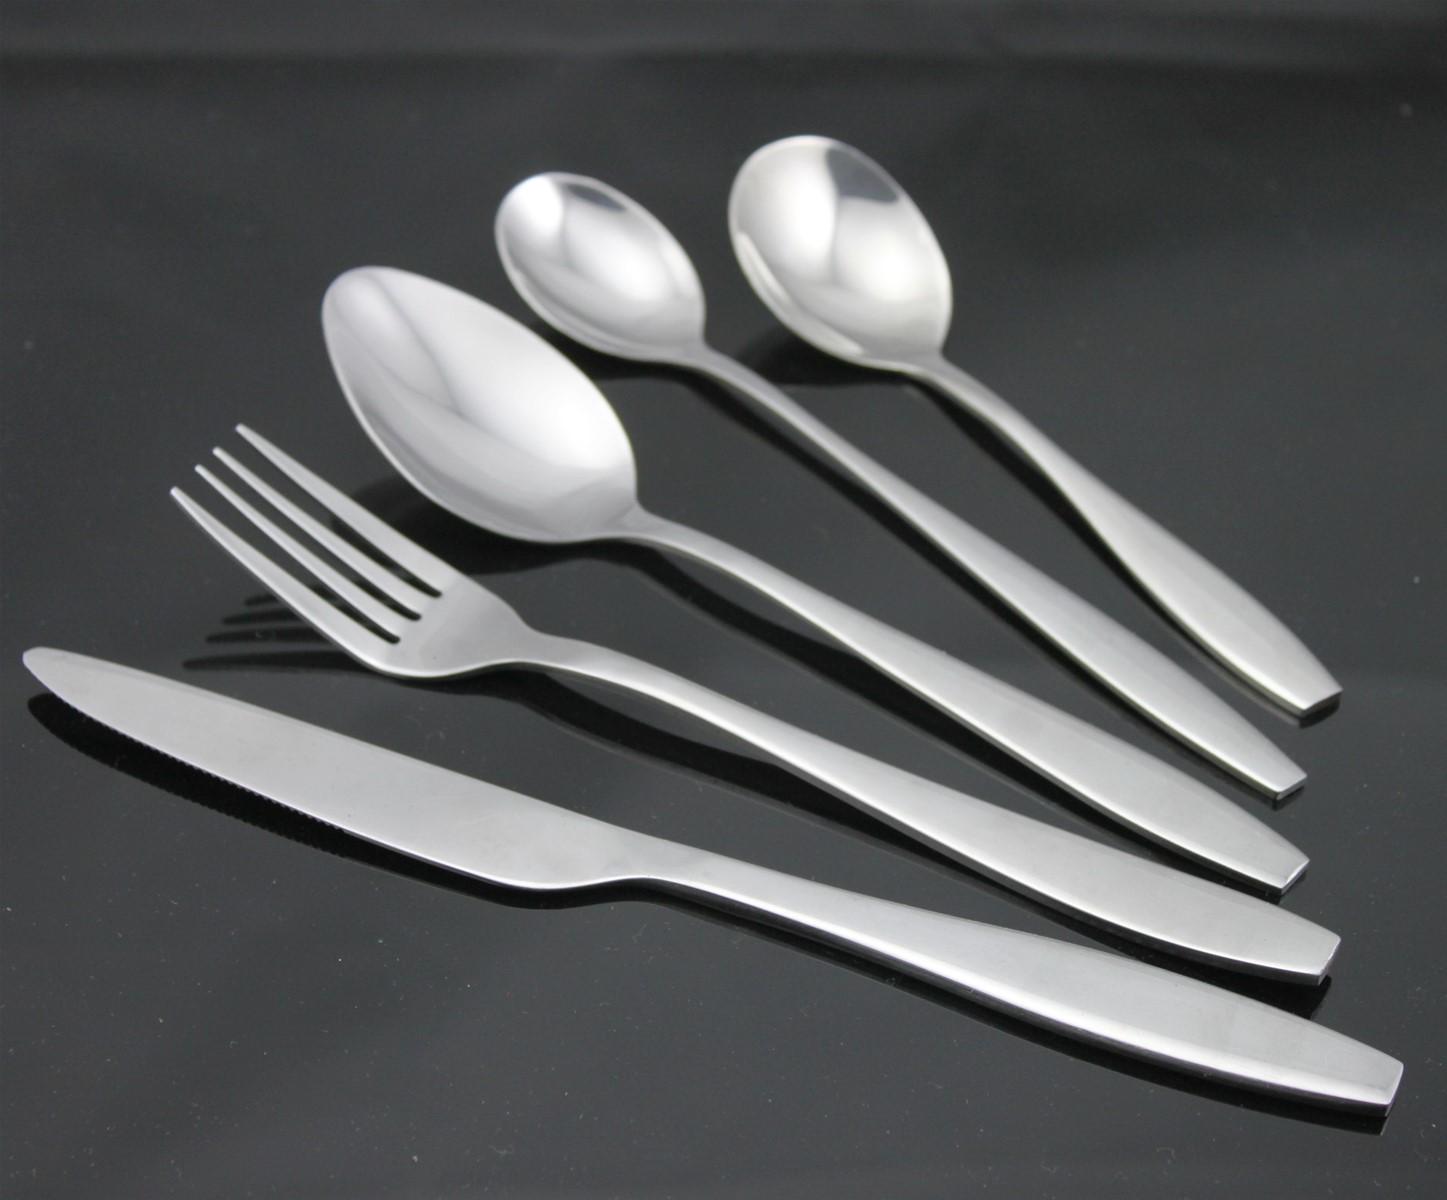 stainless steel cutlery set dinnerware tableware flatware china mainland flatware sets. Black Bedroom Furniture Sets. Home Design Ideas